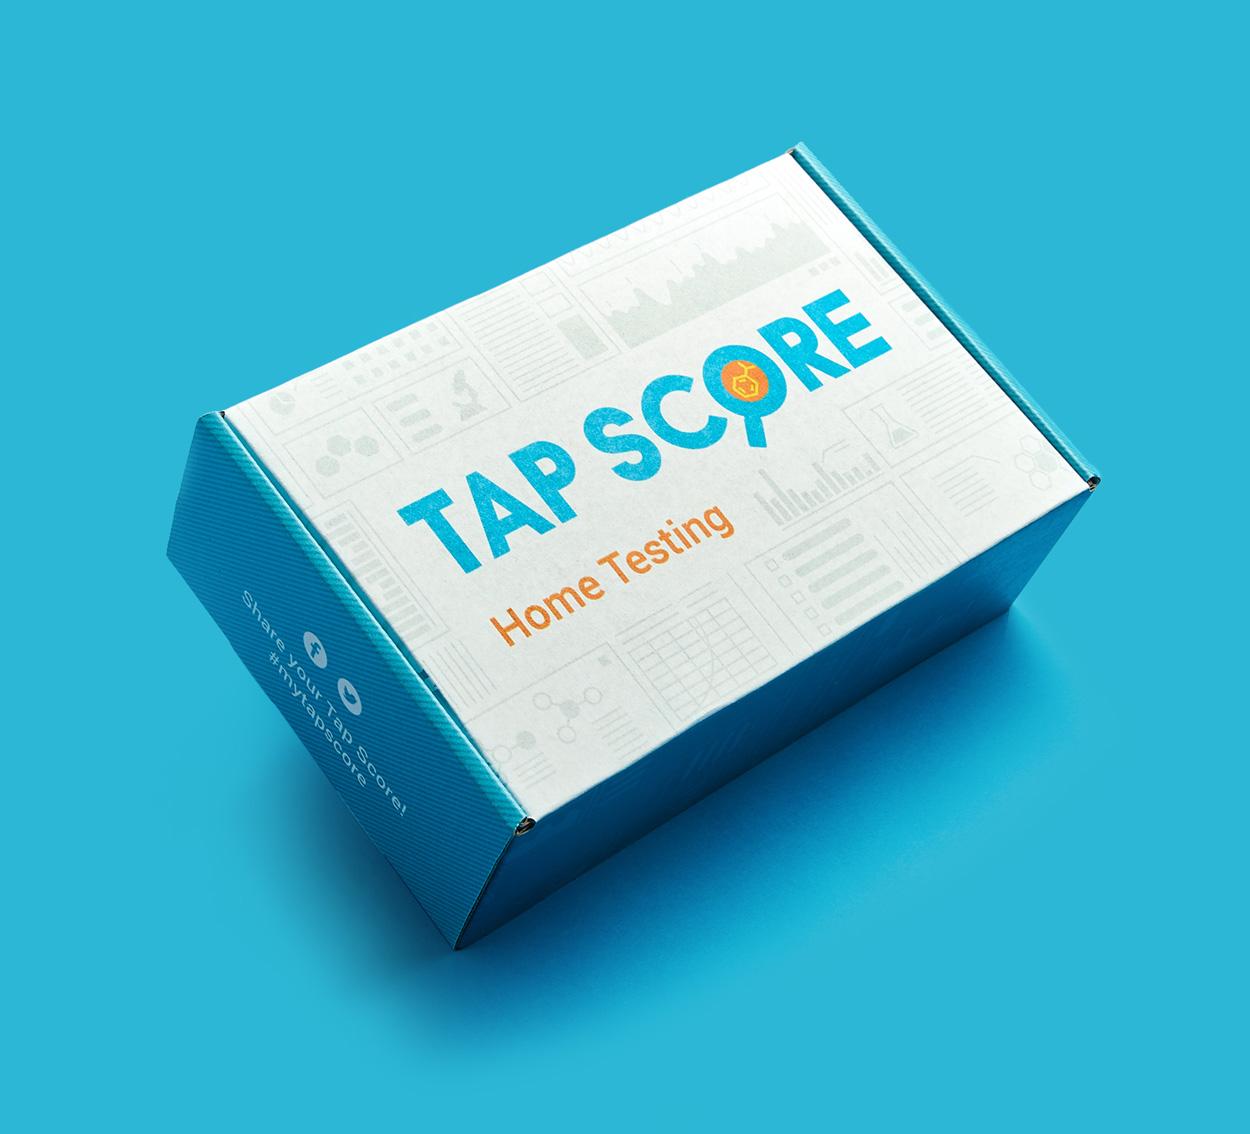 Box-Tap-Score-2019-Right-Angle-on-Blue-FLAT-1